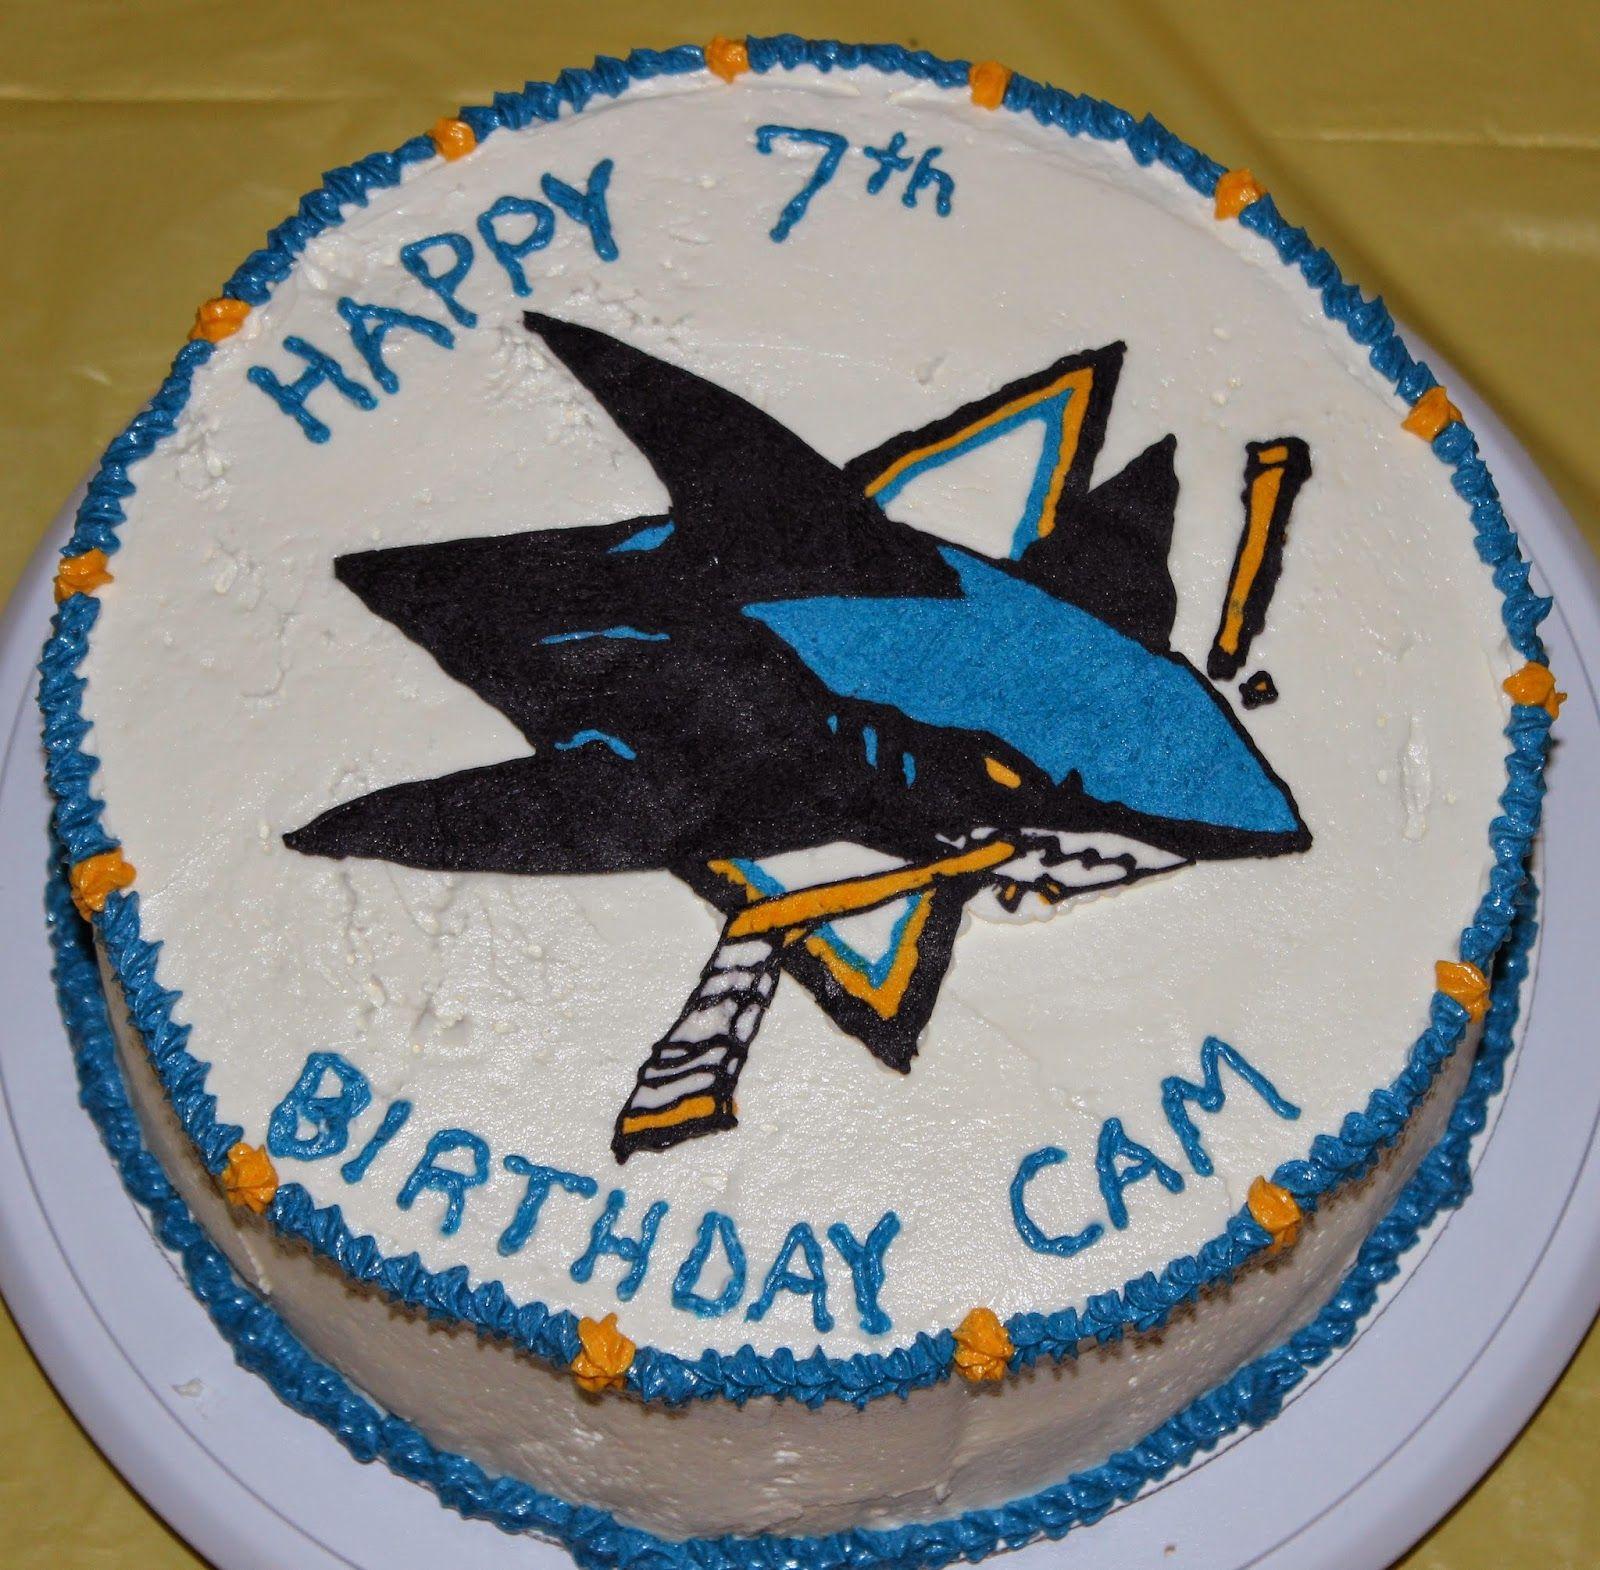 Fabulous San Jose Sharks Cake Shark Cake Cake Happy 7Th Birthday Funny Birthday Cards Online Inifofree Goldxyz